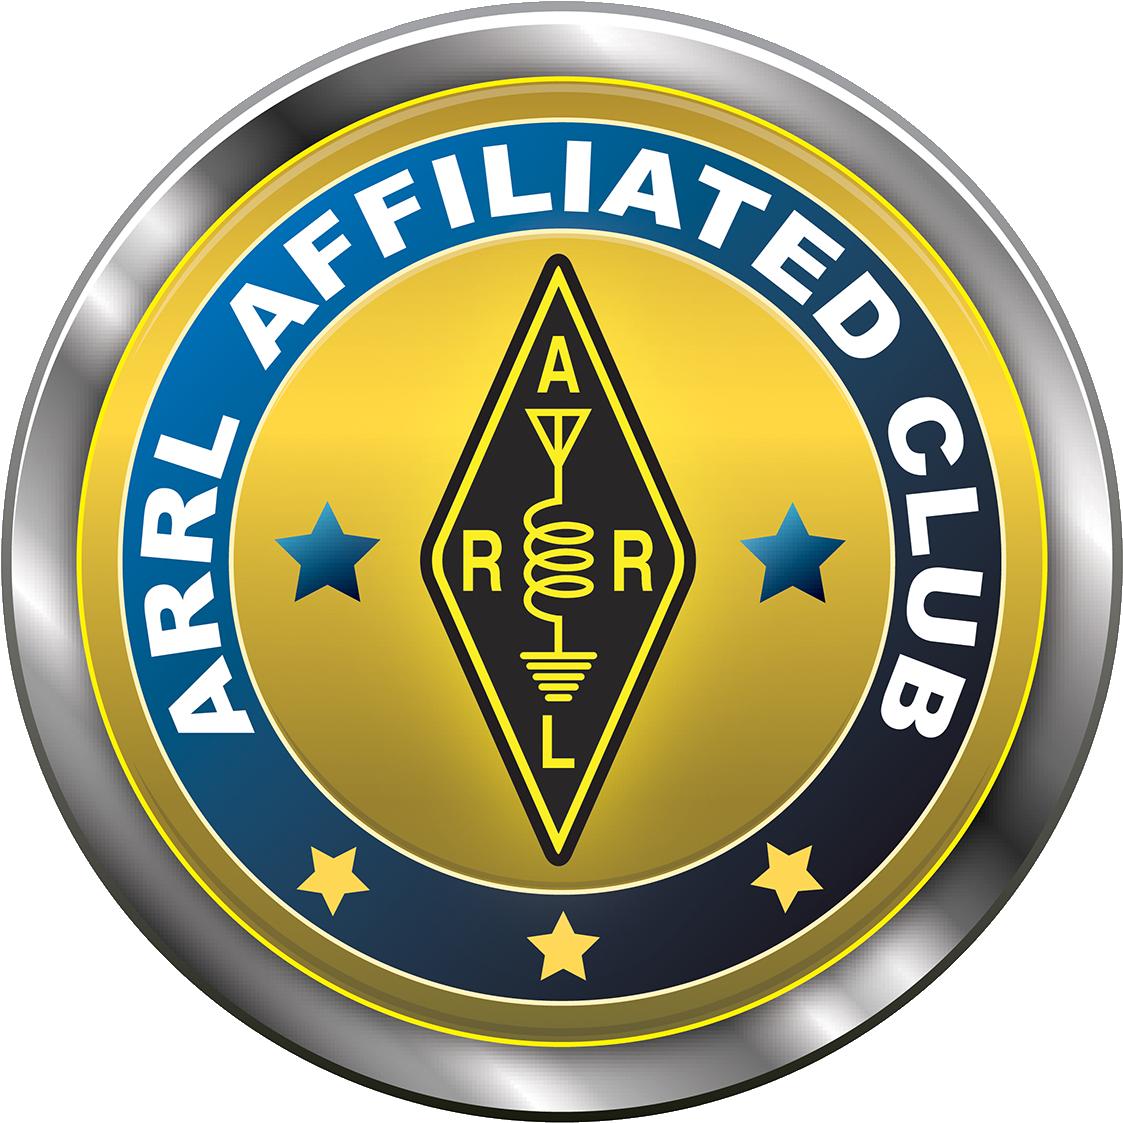 Barstow Amateur Radio Club